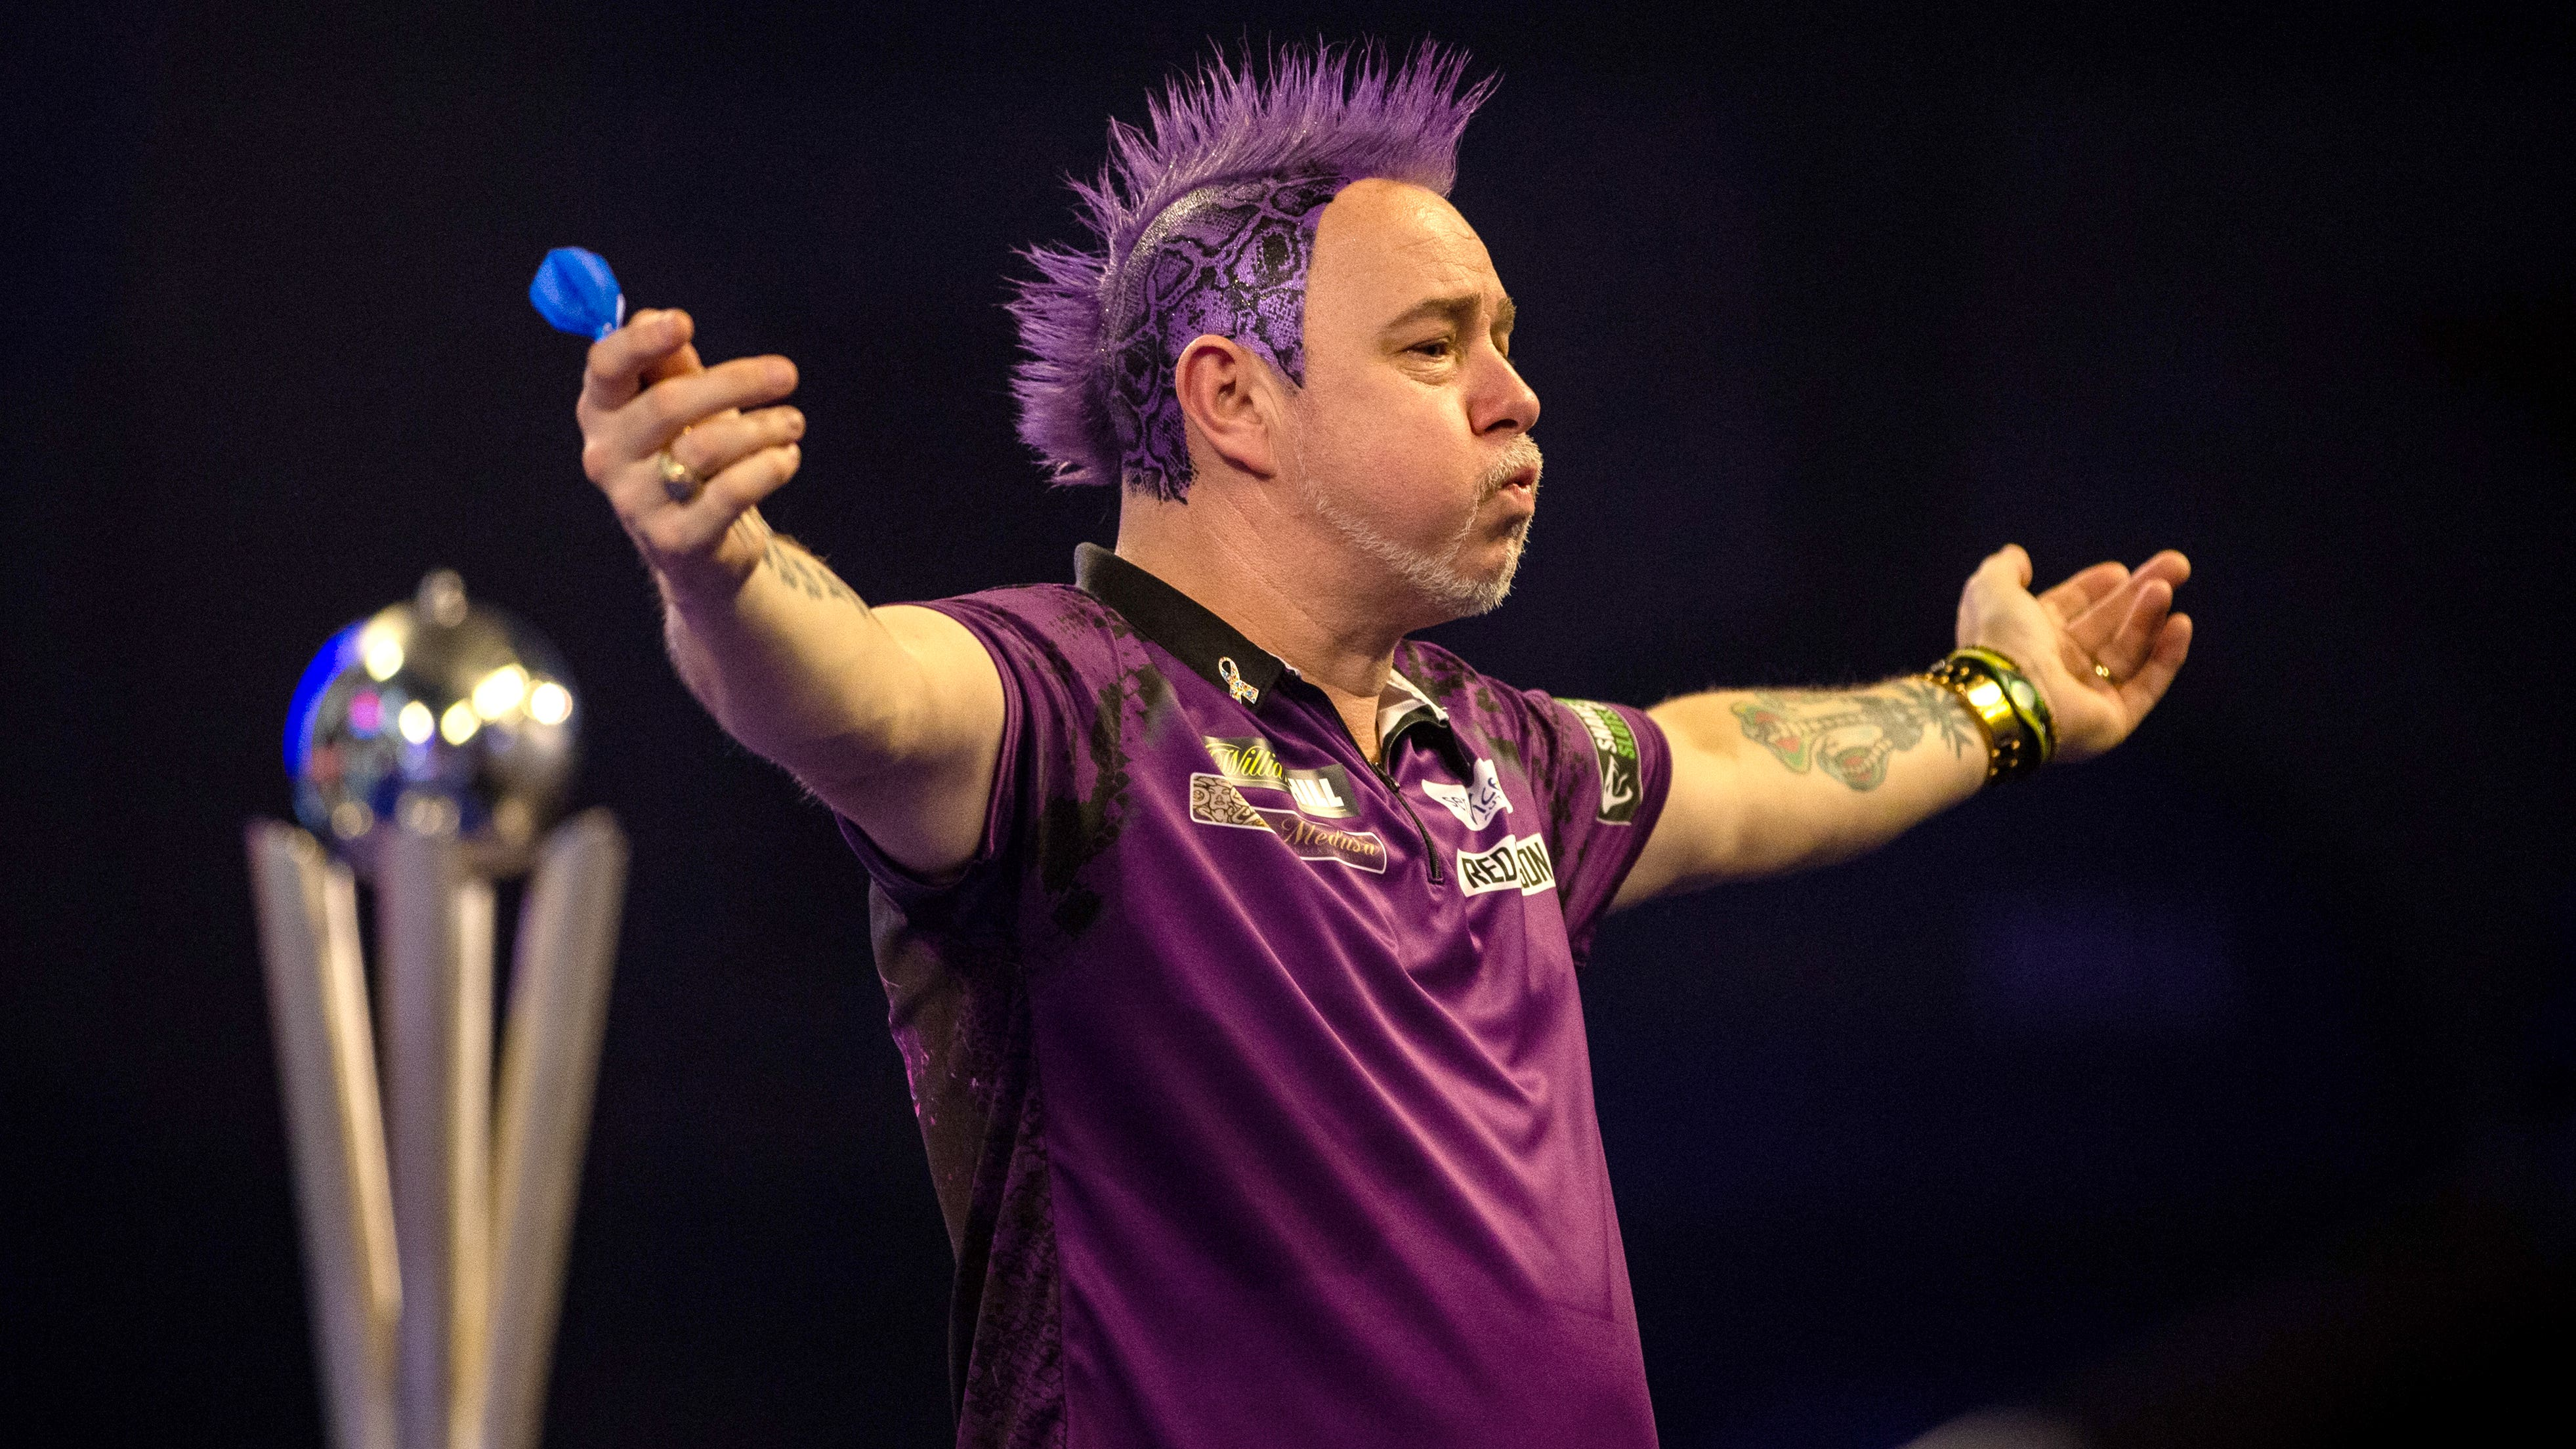 World champion Peter Wright won't let lockdown burst his bubble as darts  returns | BT Sport